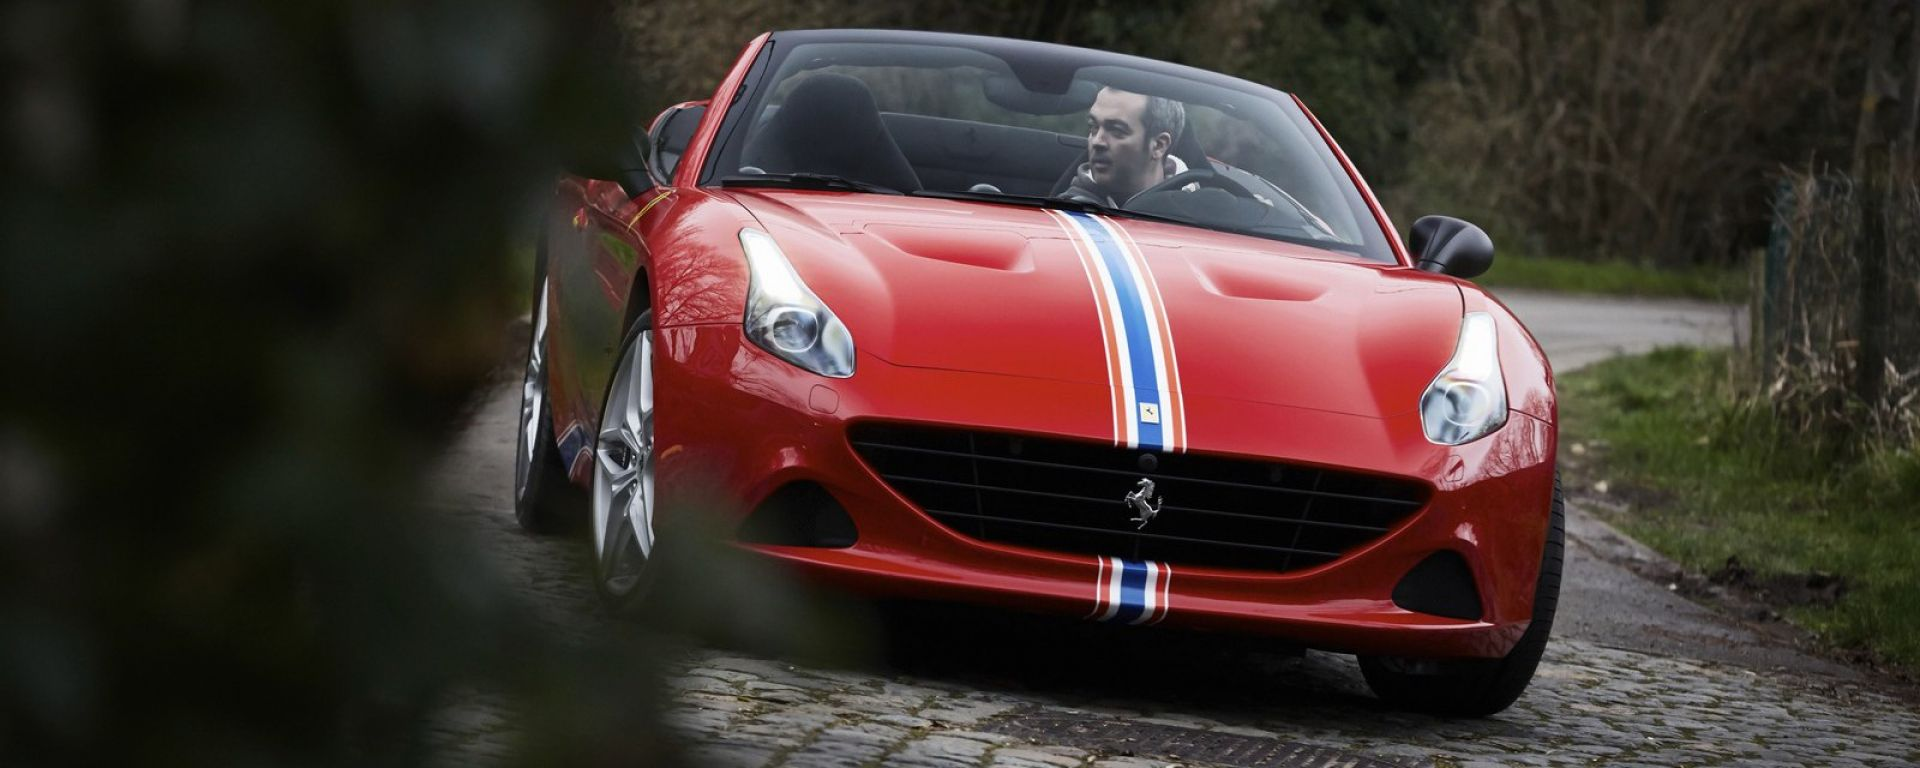 Ferrari California T Francorchamps Motors Tribute Tailor Made